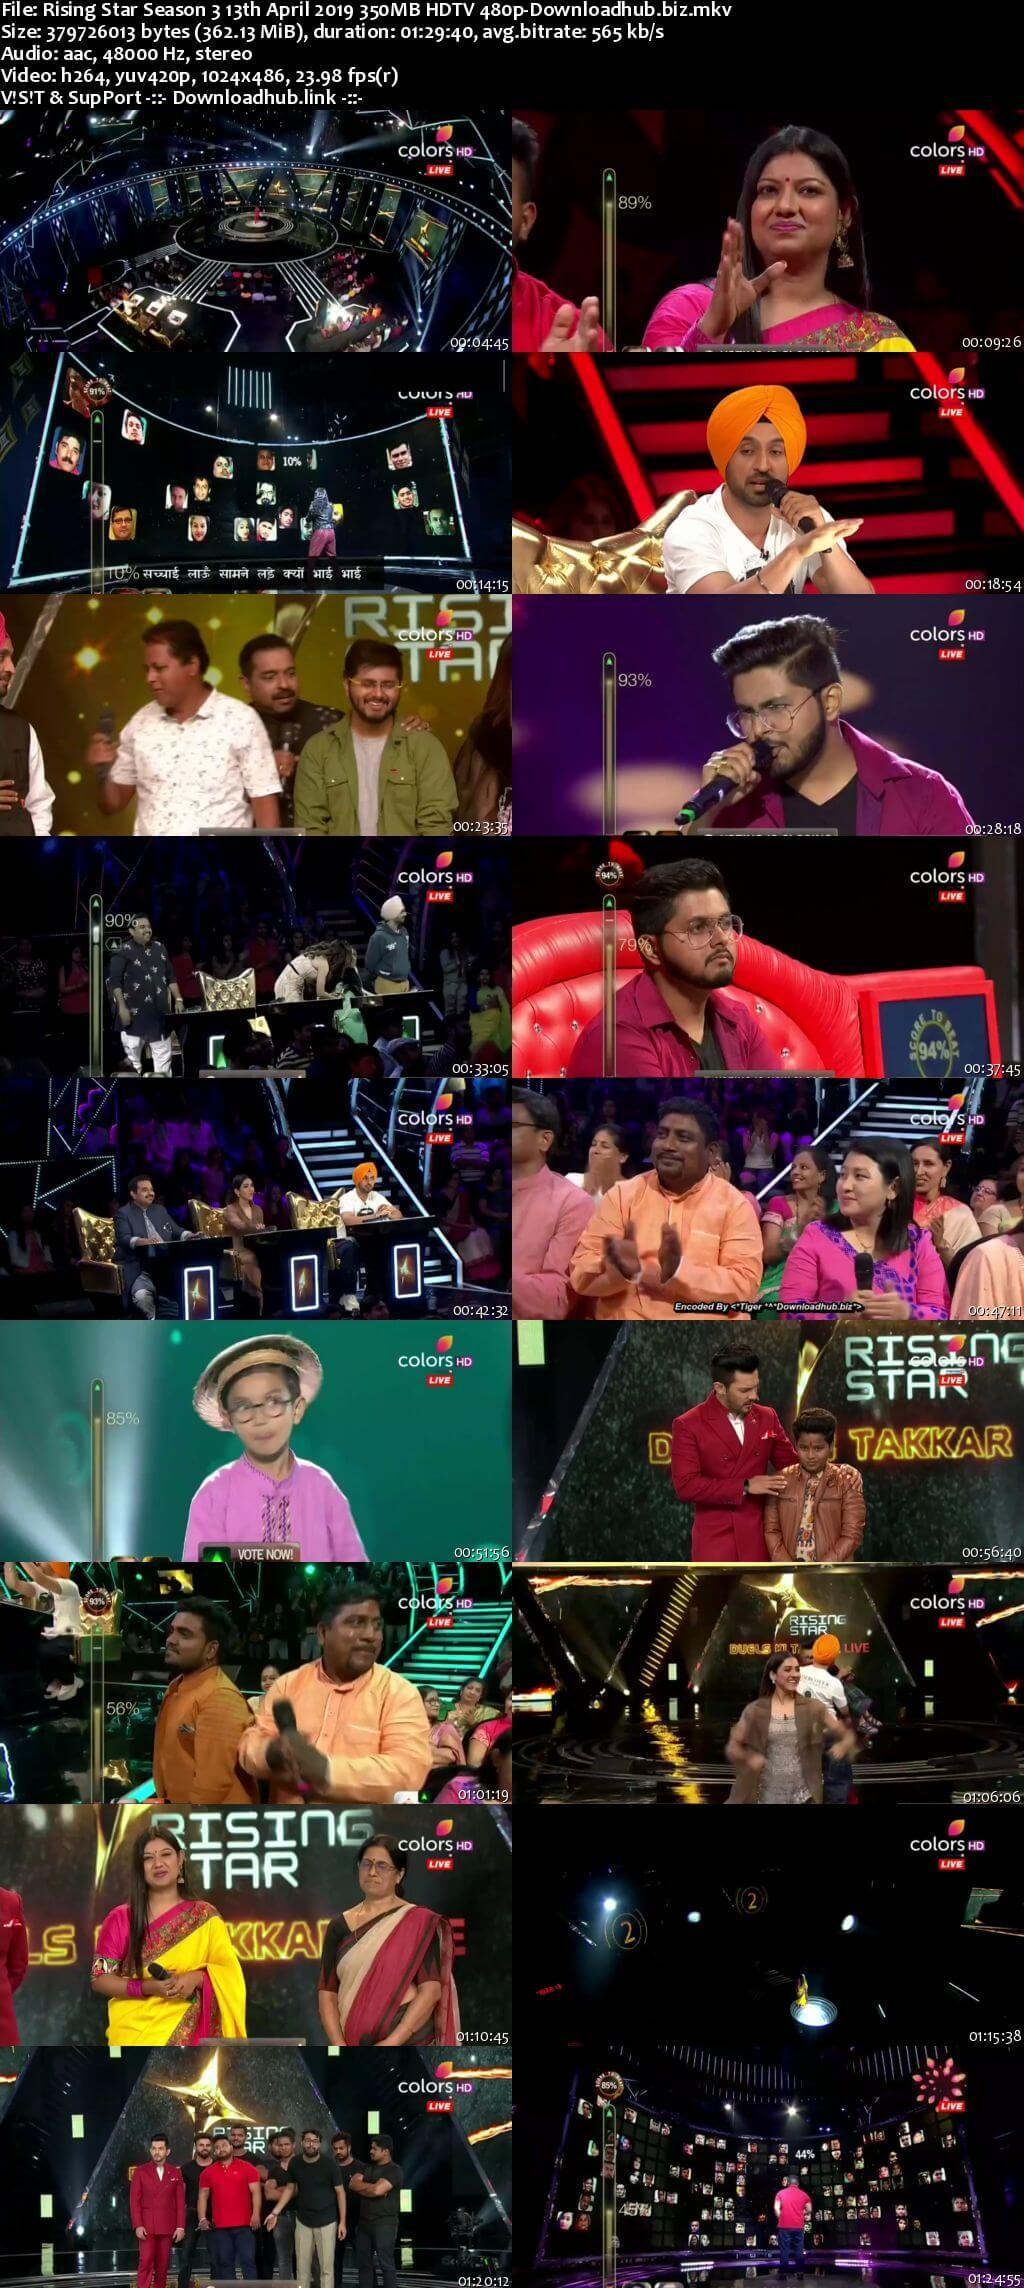 Rising Star Season 3 13 April 2019 Episode 09 HDTV 480p